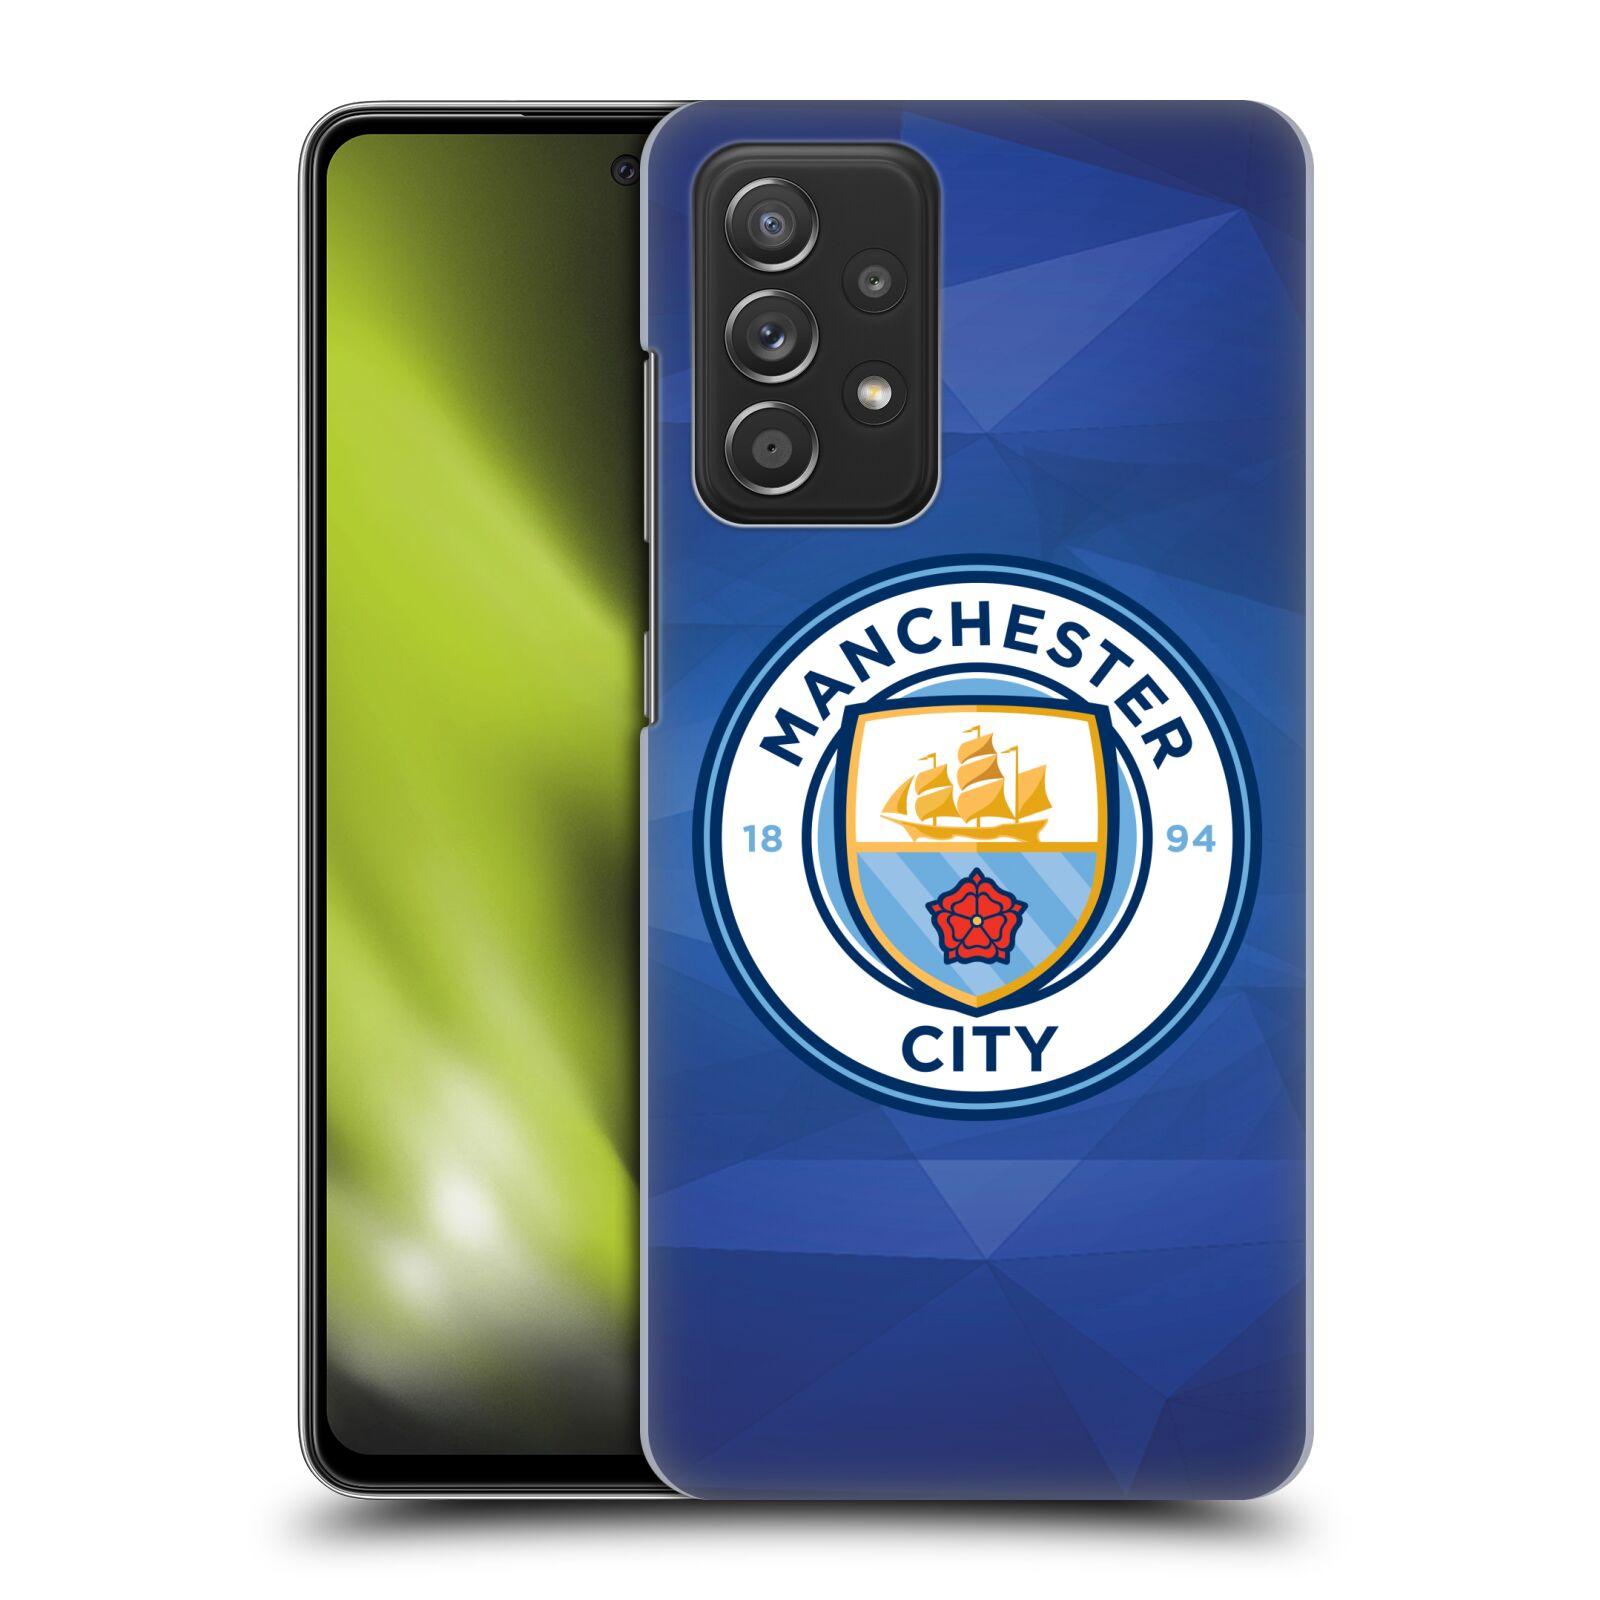 Plastové pouzdro na mobil Samsung Galaxy A52 / A52 5G / A52s 5G - Head Case - Manchester City FC - Modré nové logo